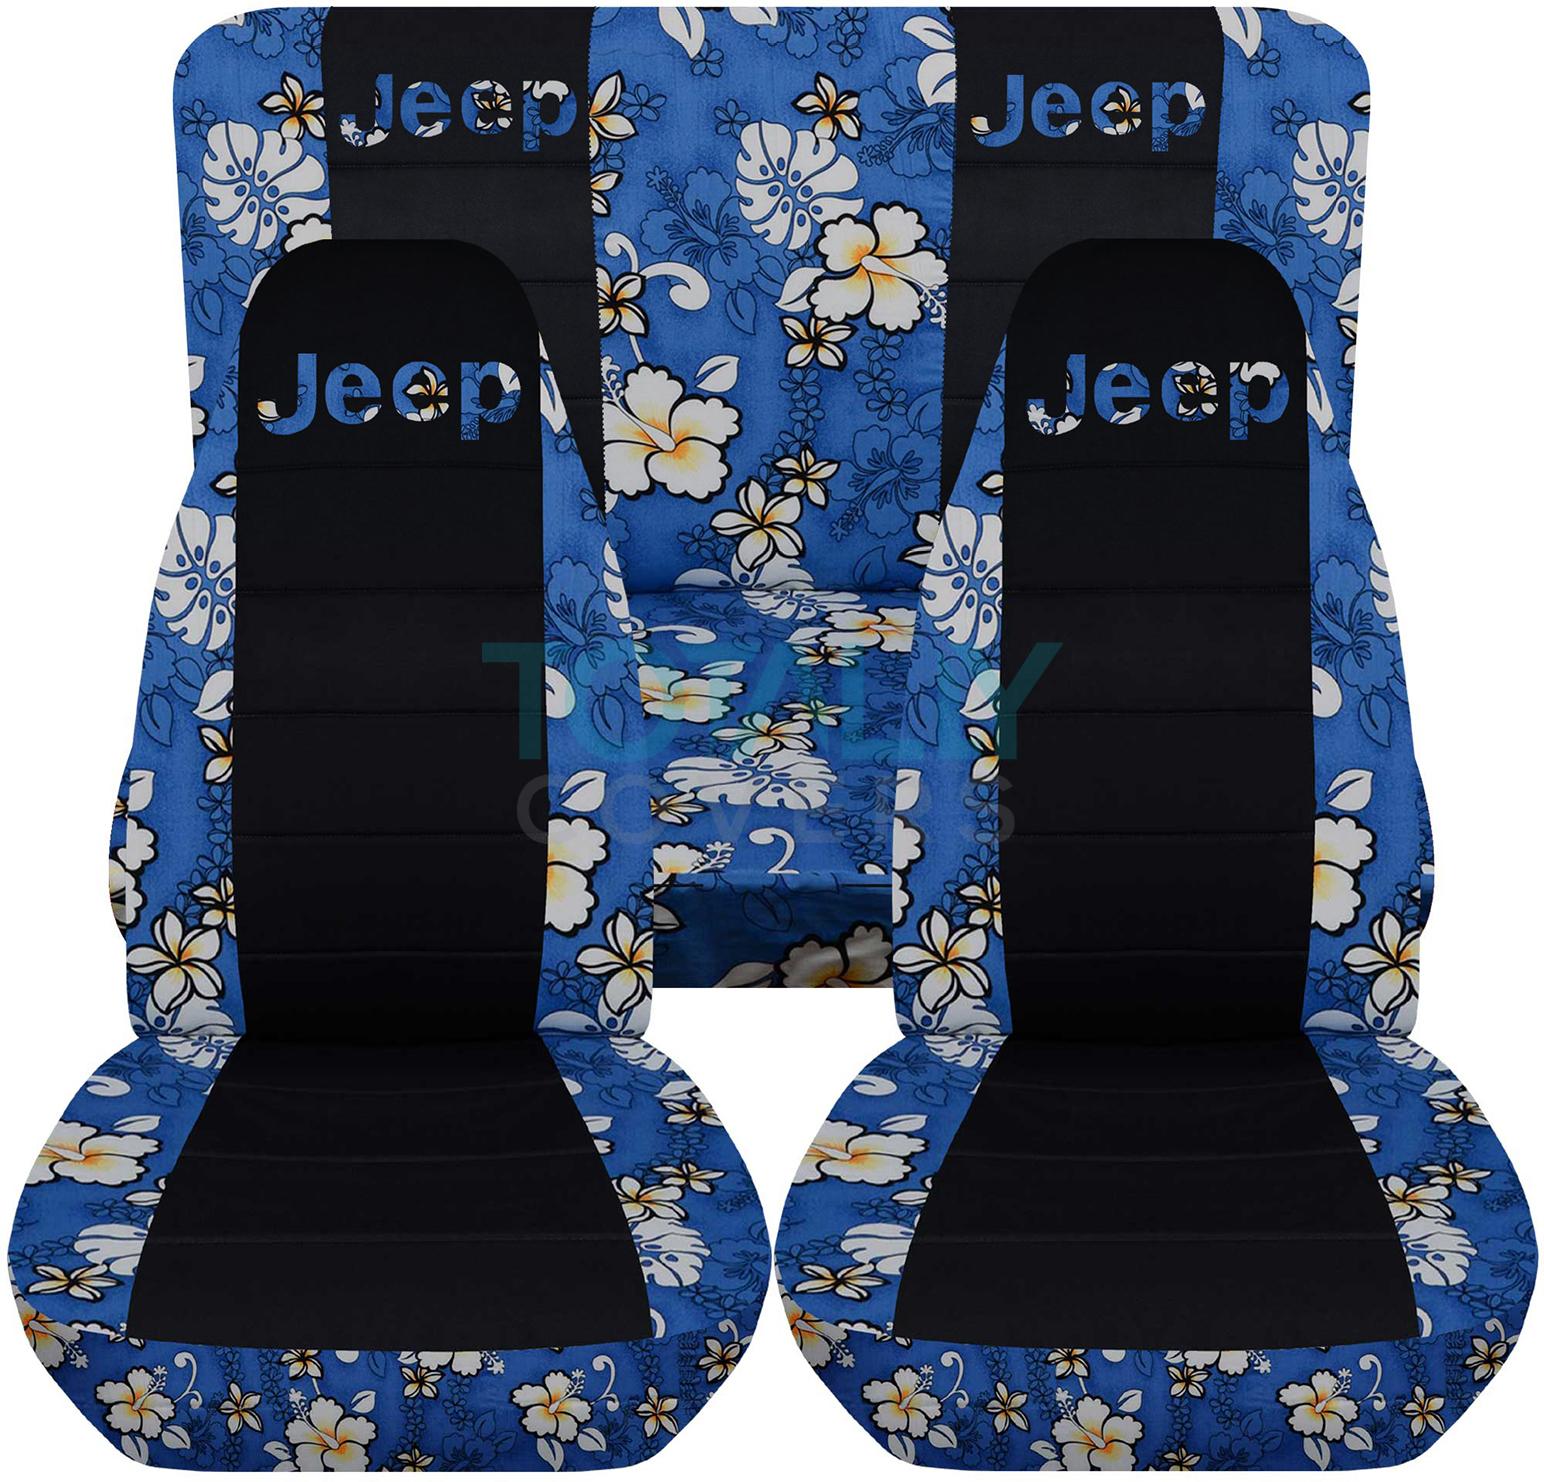 Jeep Wrangler Blue Hawaiian And Black Seat Covers With Jeep Logo ...